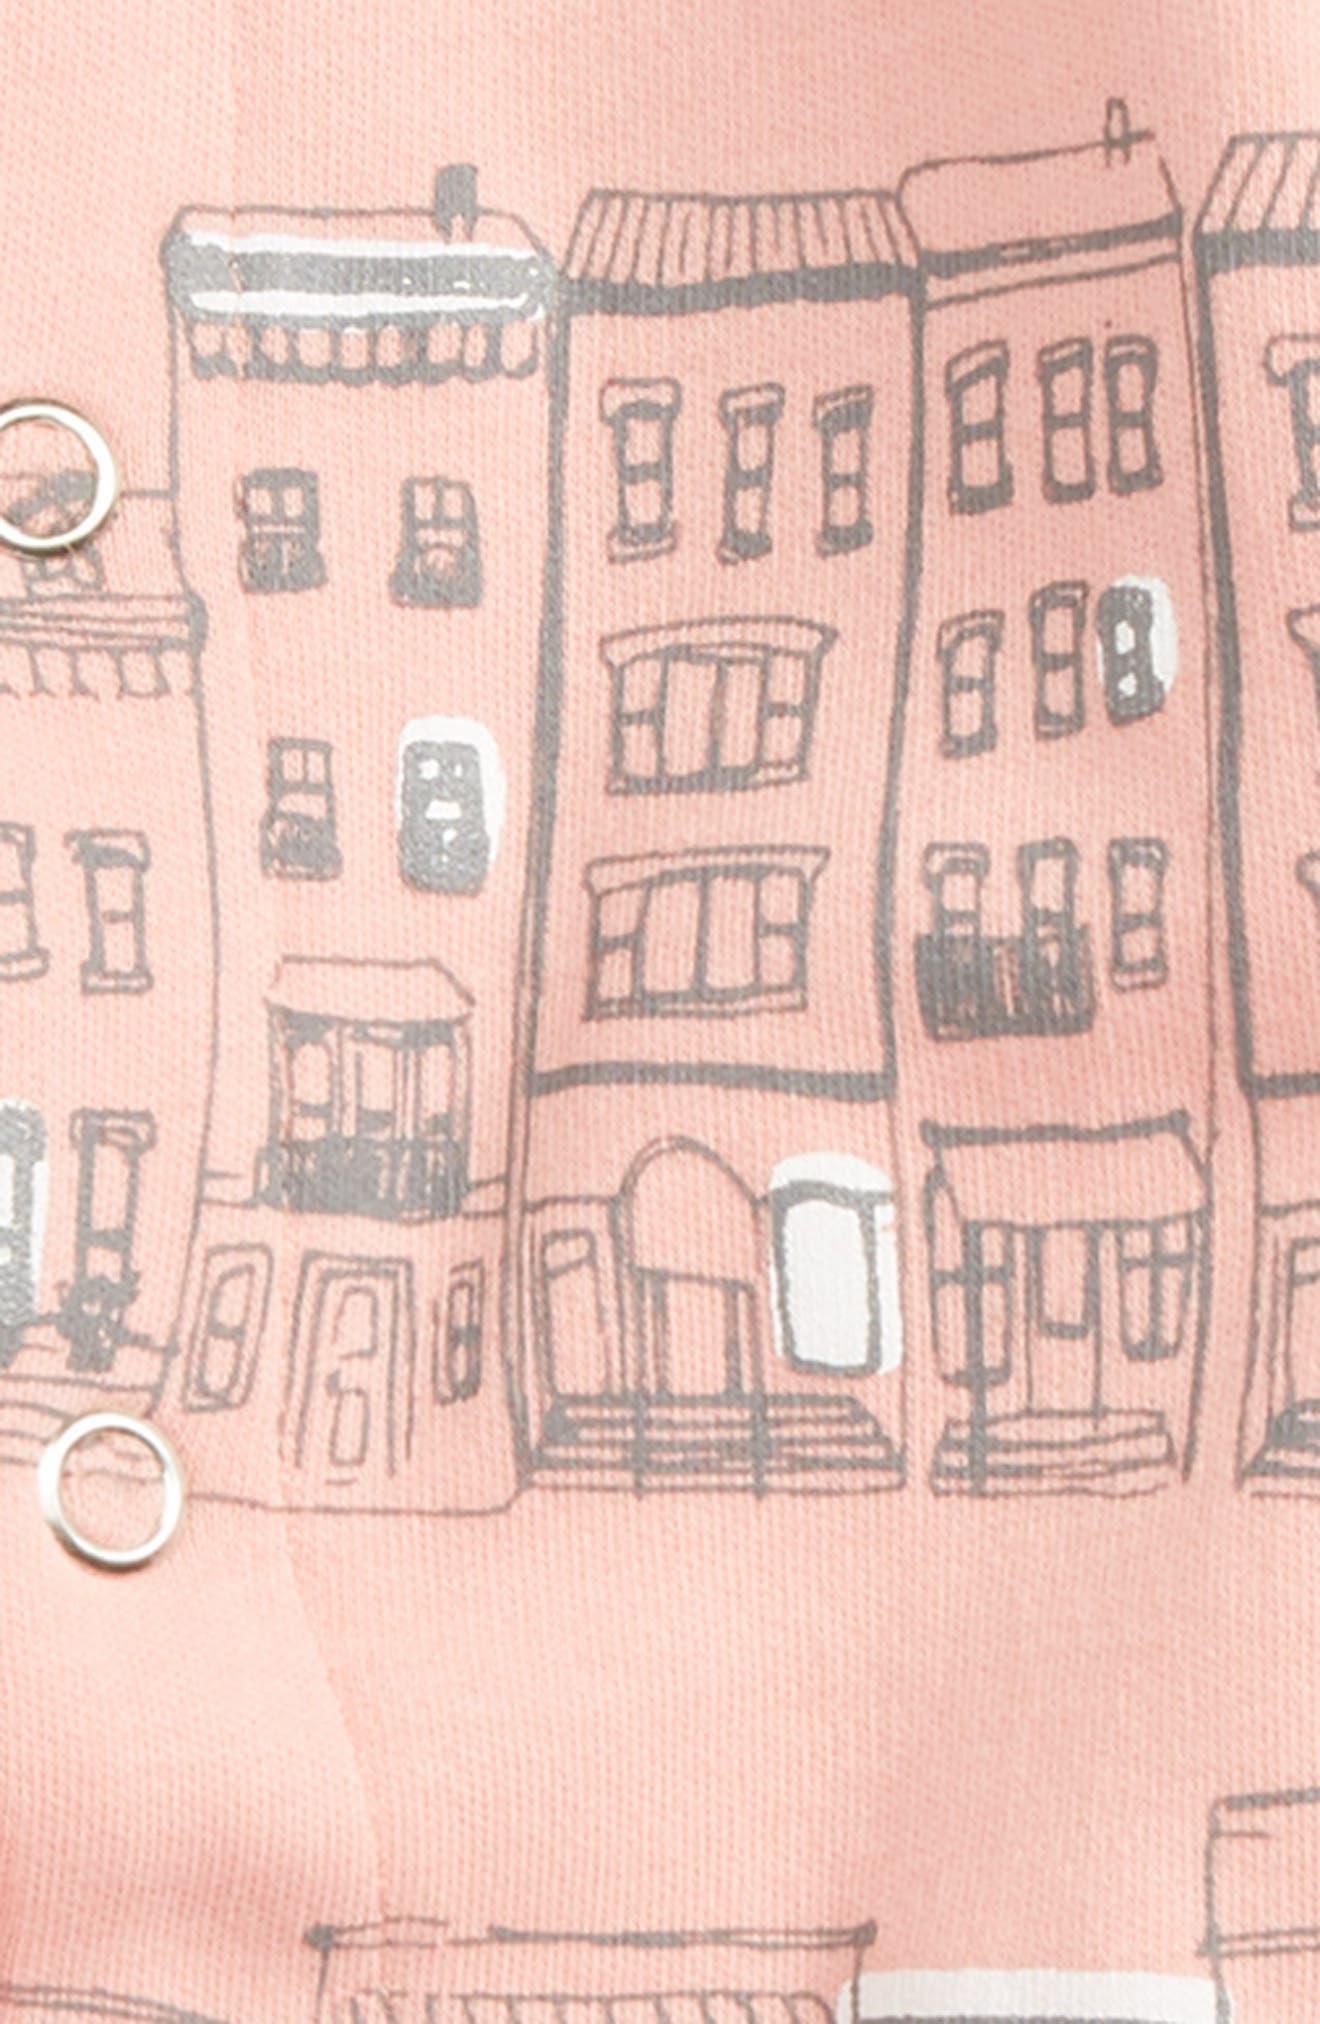 City Block Organic Cotton Footie,                             Alternate thumbnail 2, color,                             City Block